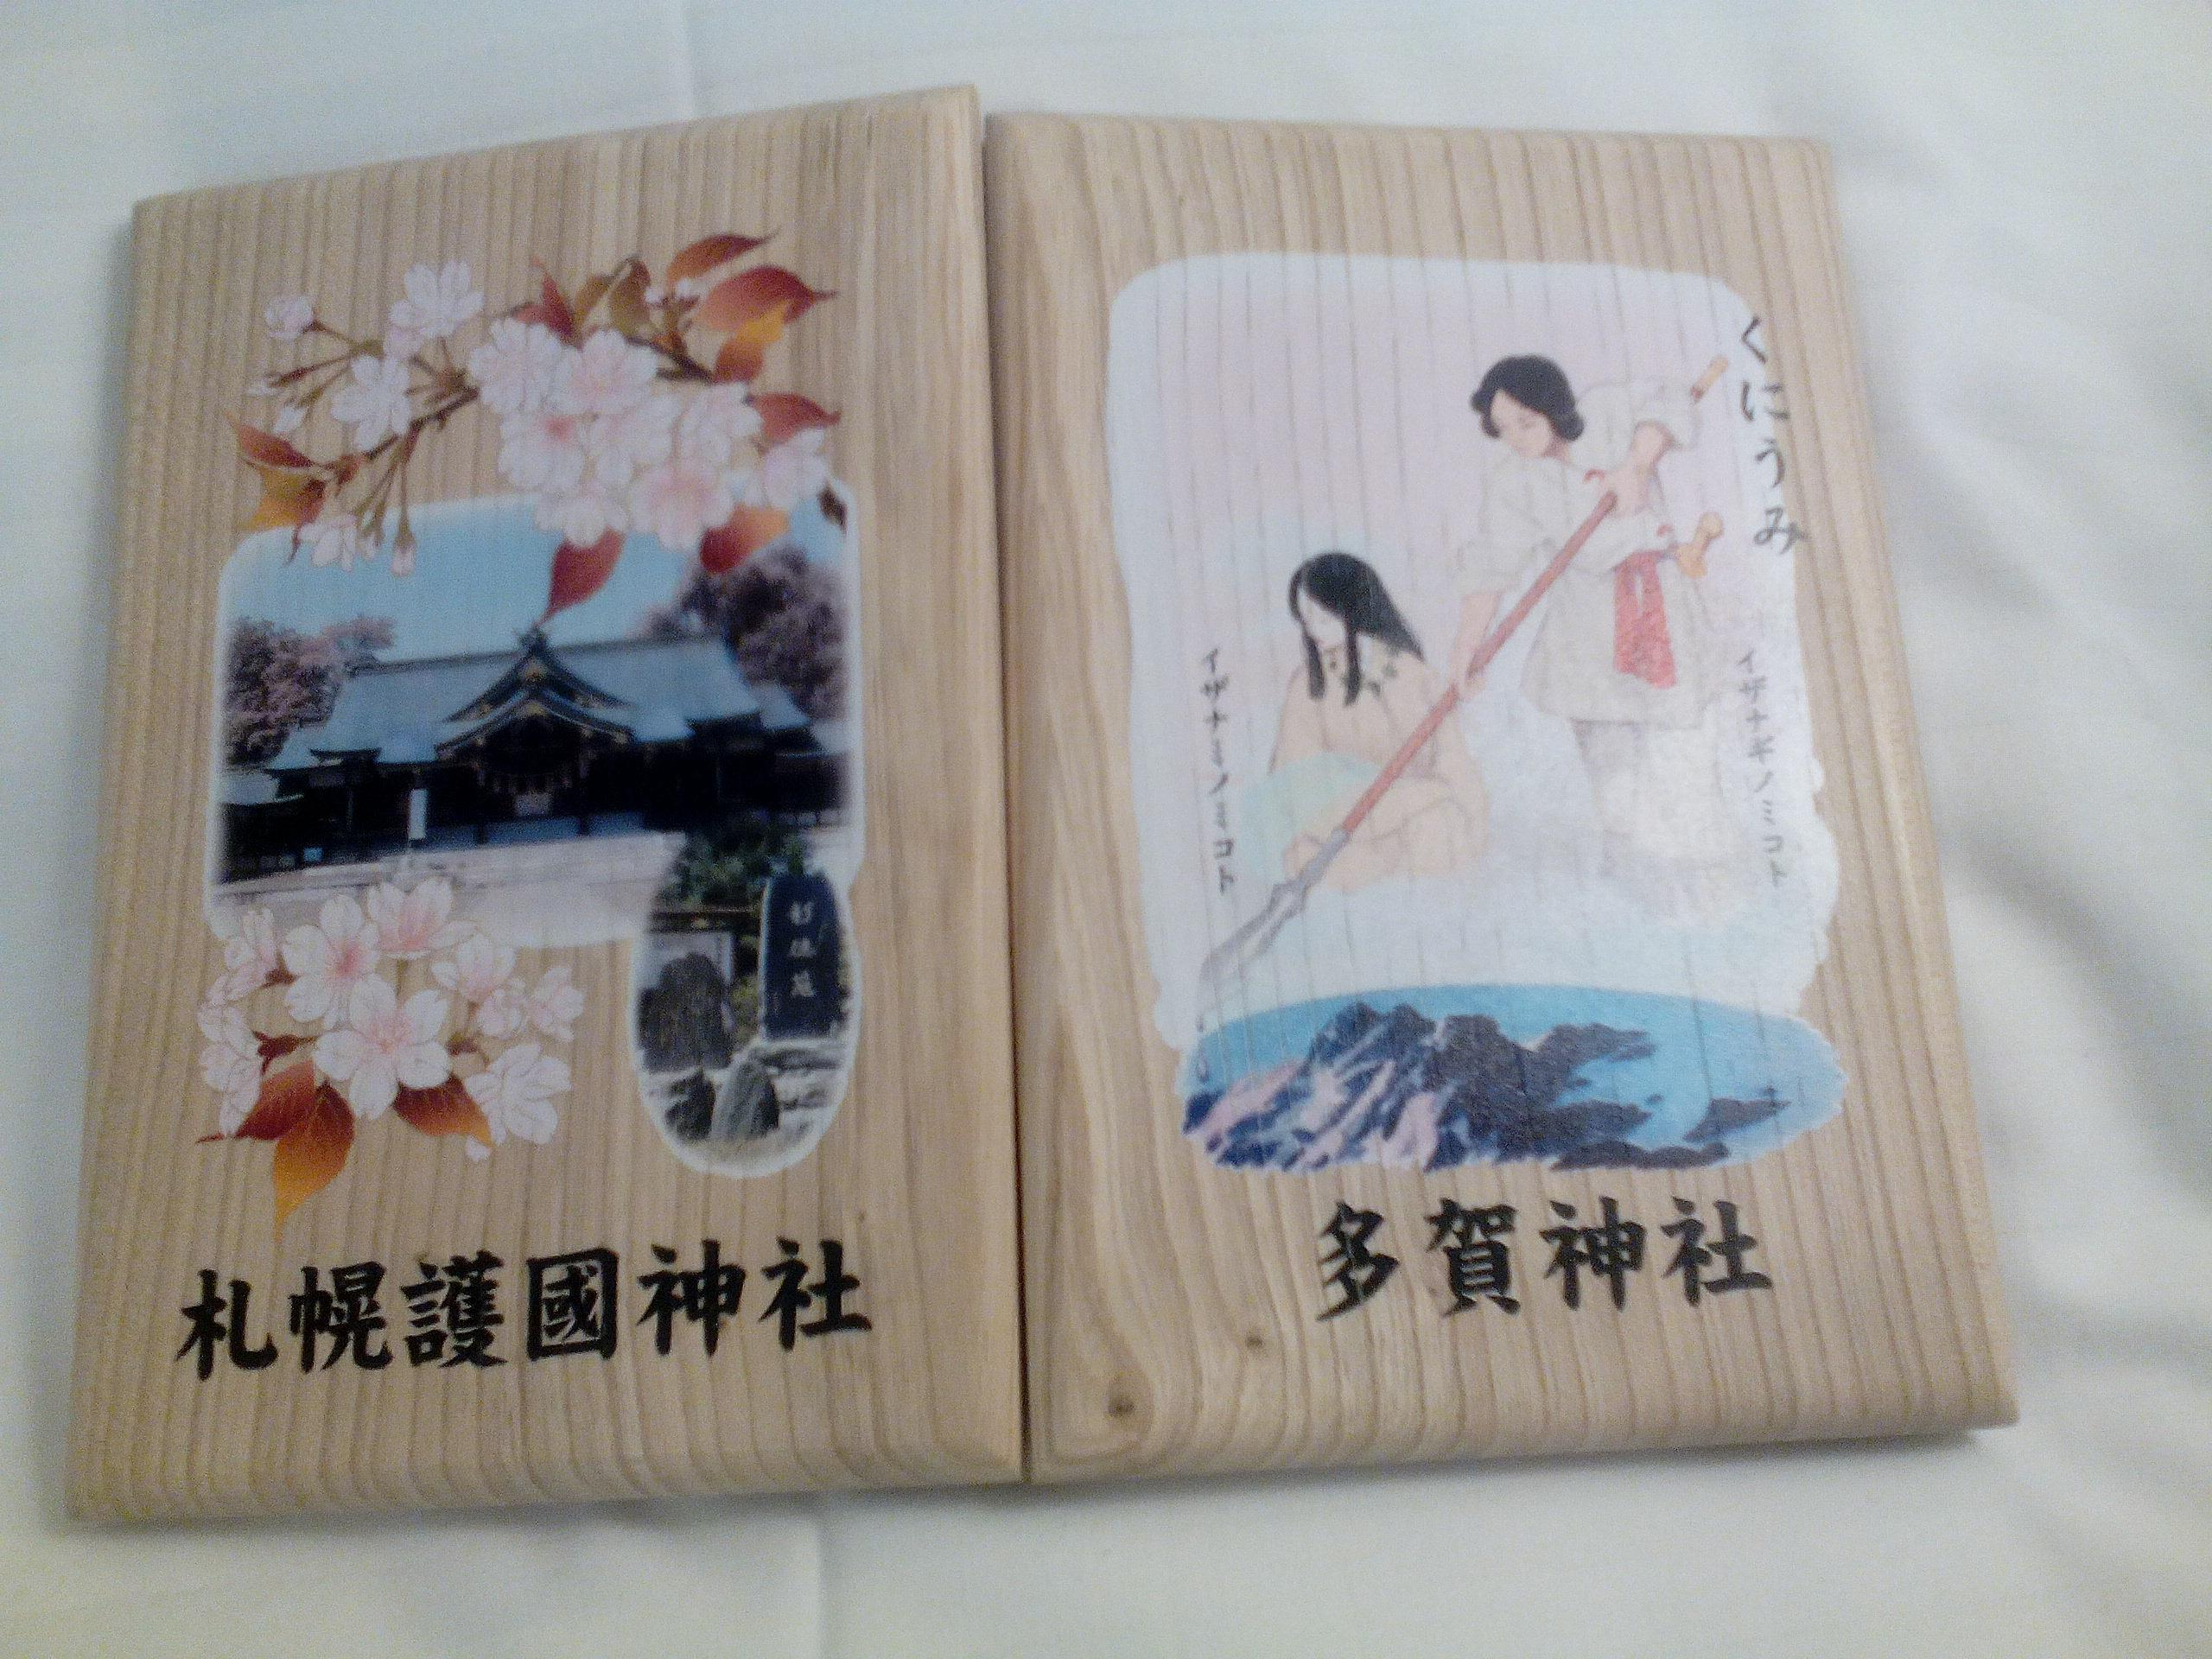 札幌護国神社の御朱印帳